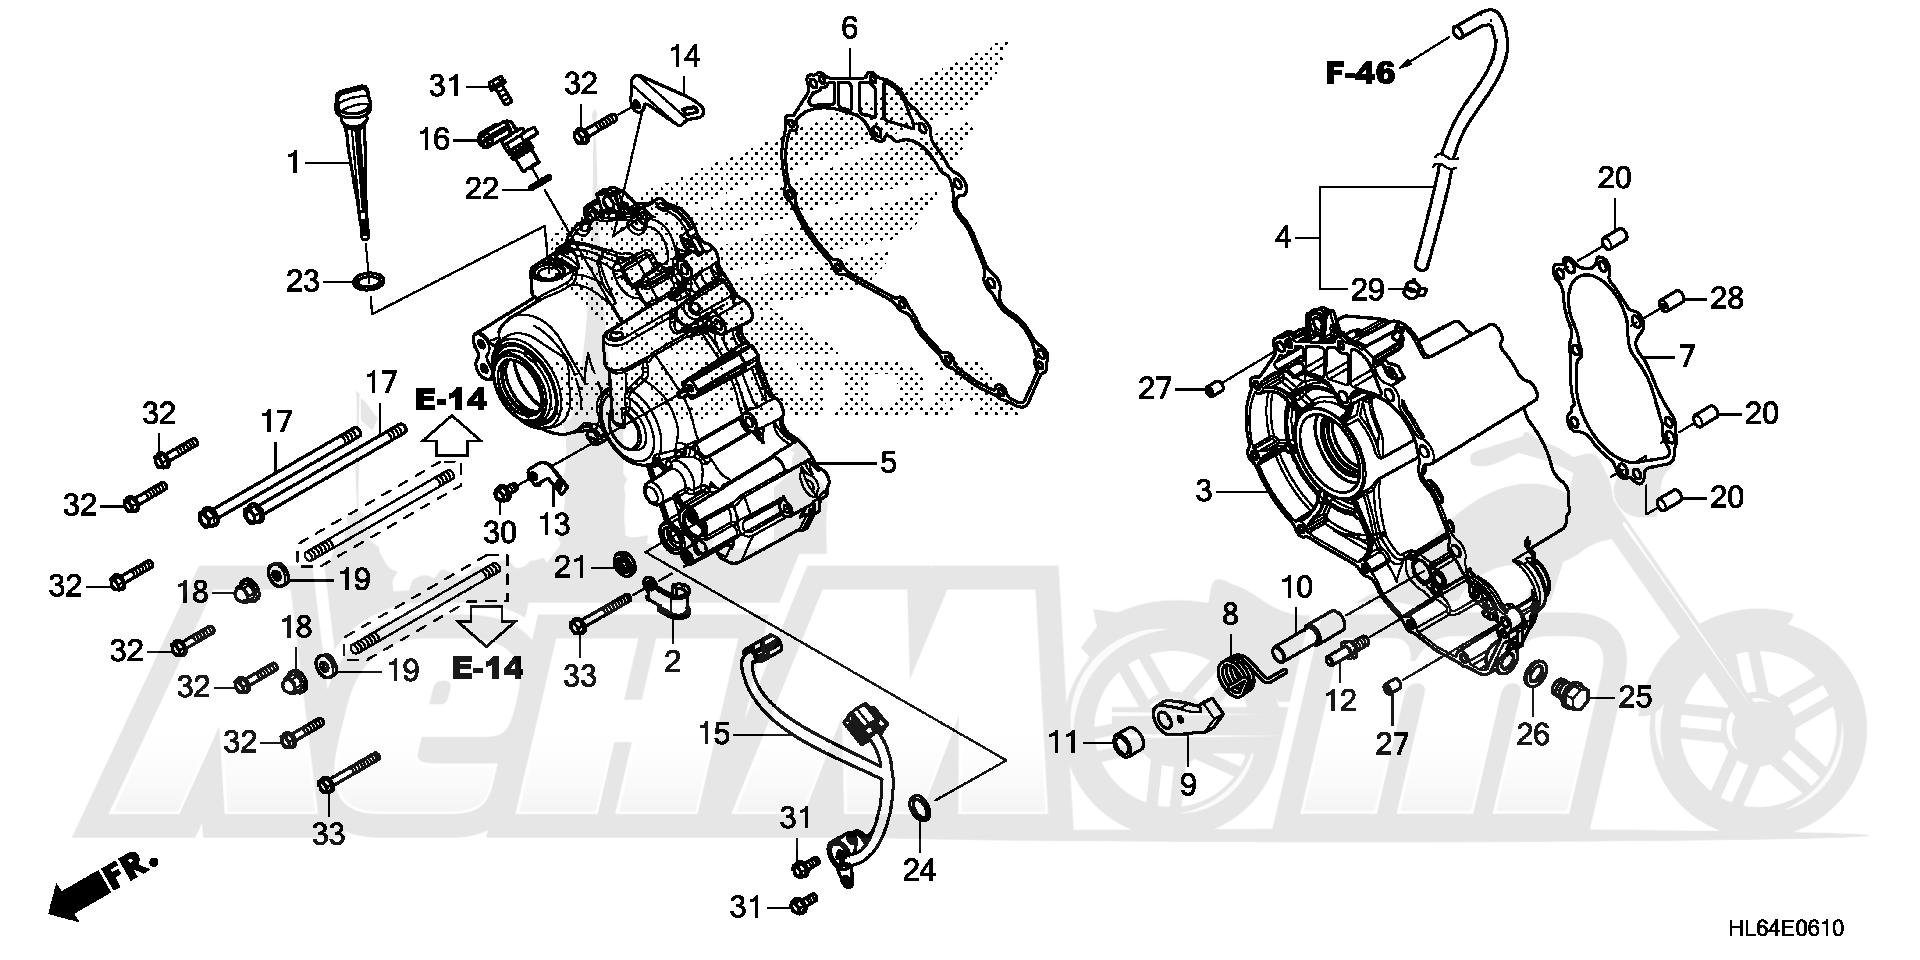 Запчасти для Квадроцикла Honda 2019 SXS1000S2R Раздел: SUB-TRANSMISSION CASE | SUB трансмиссия корпус